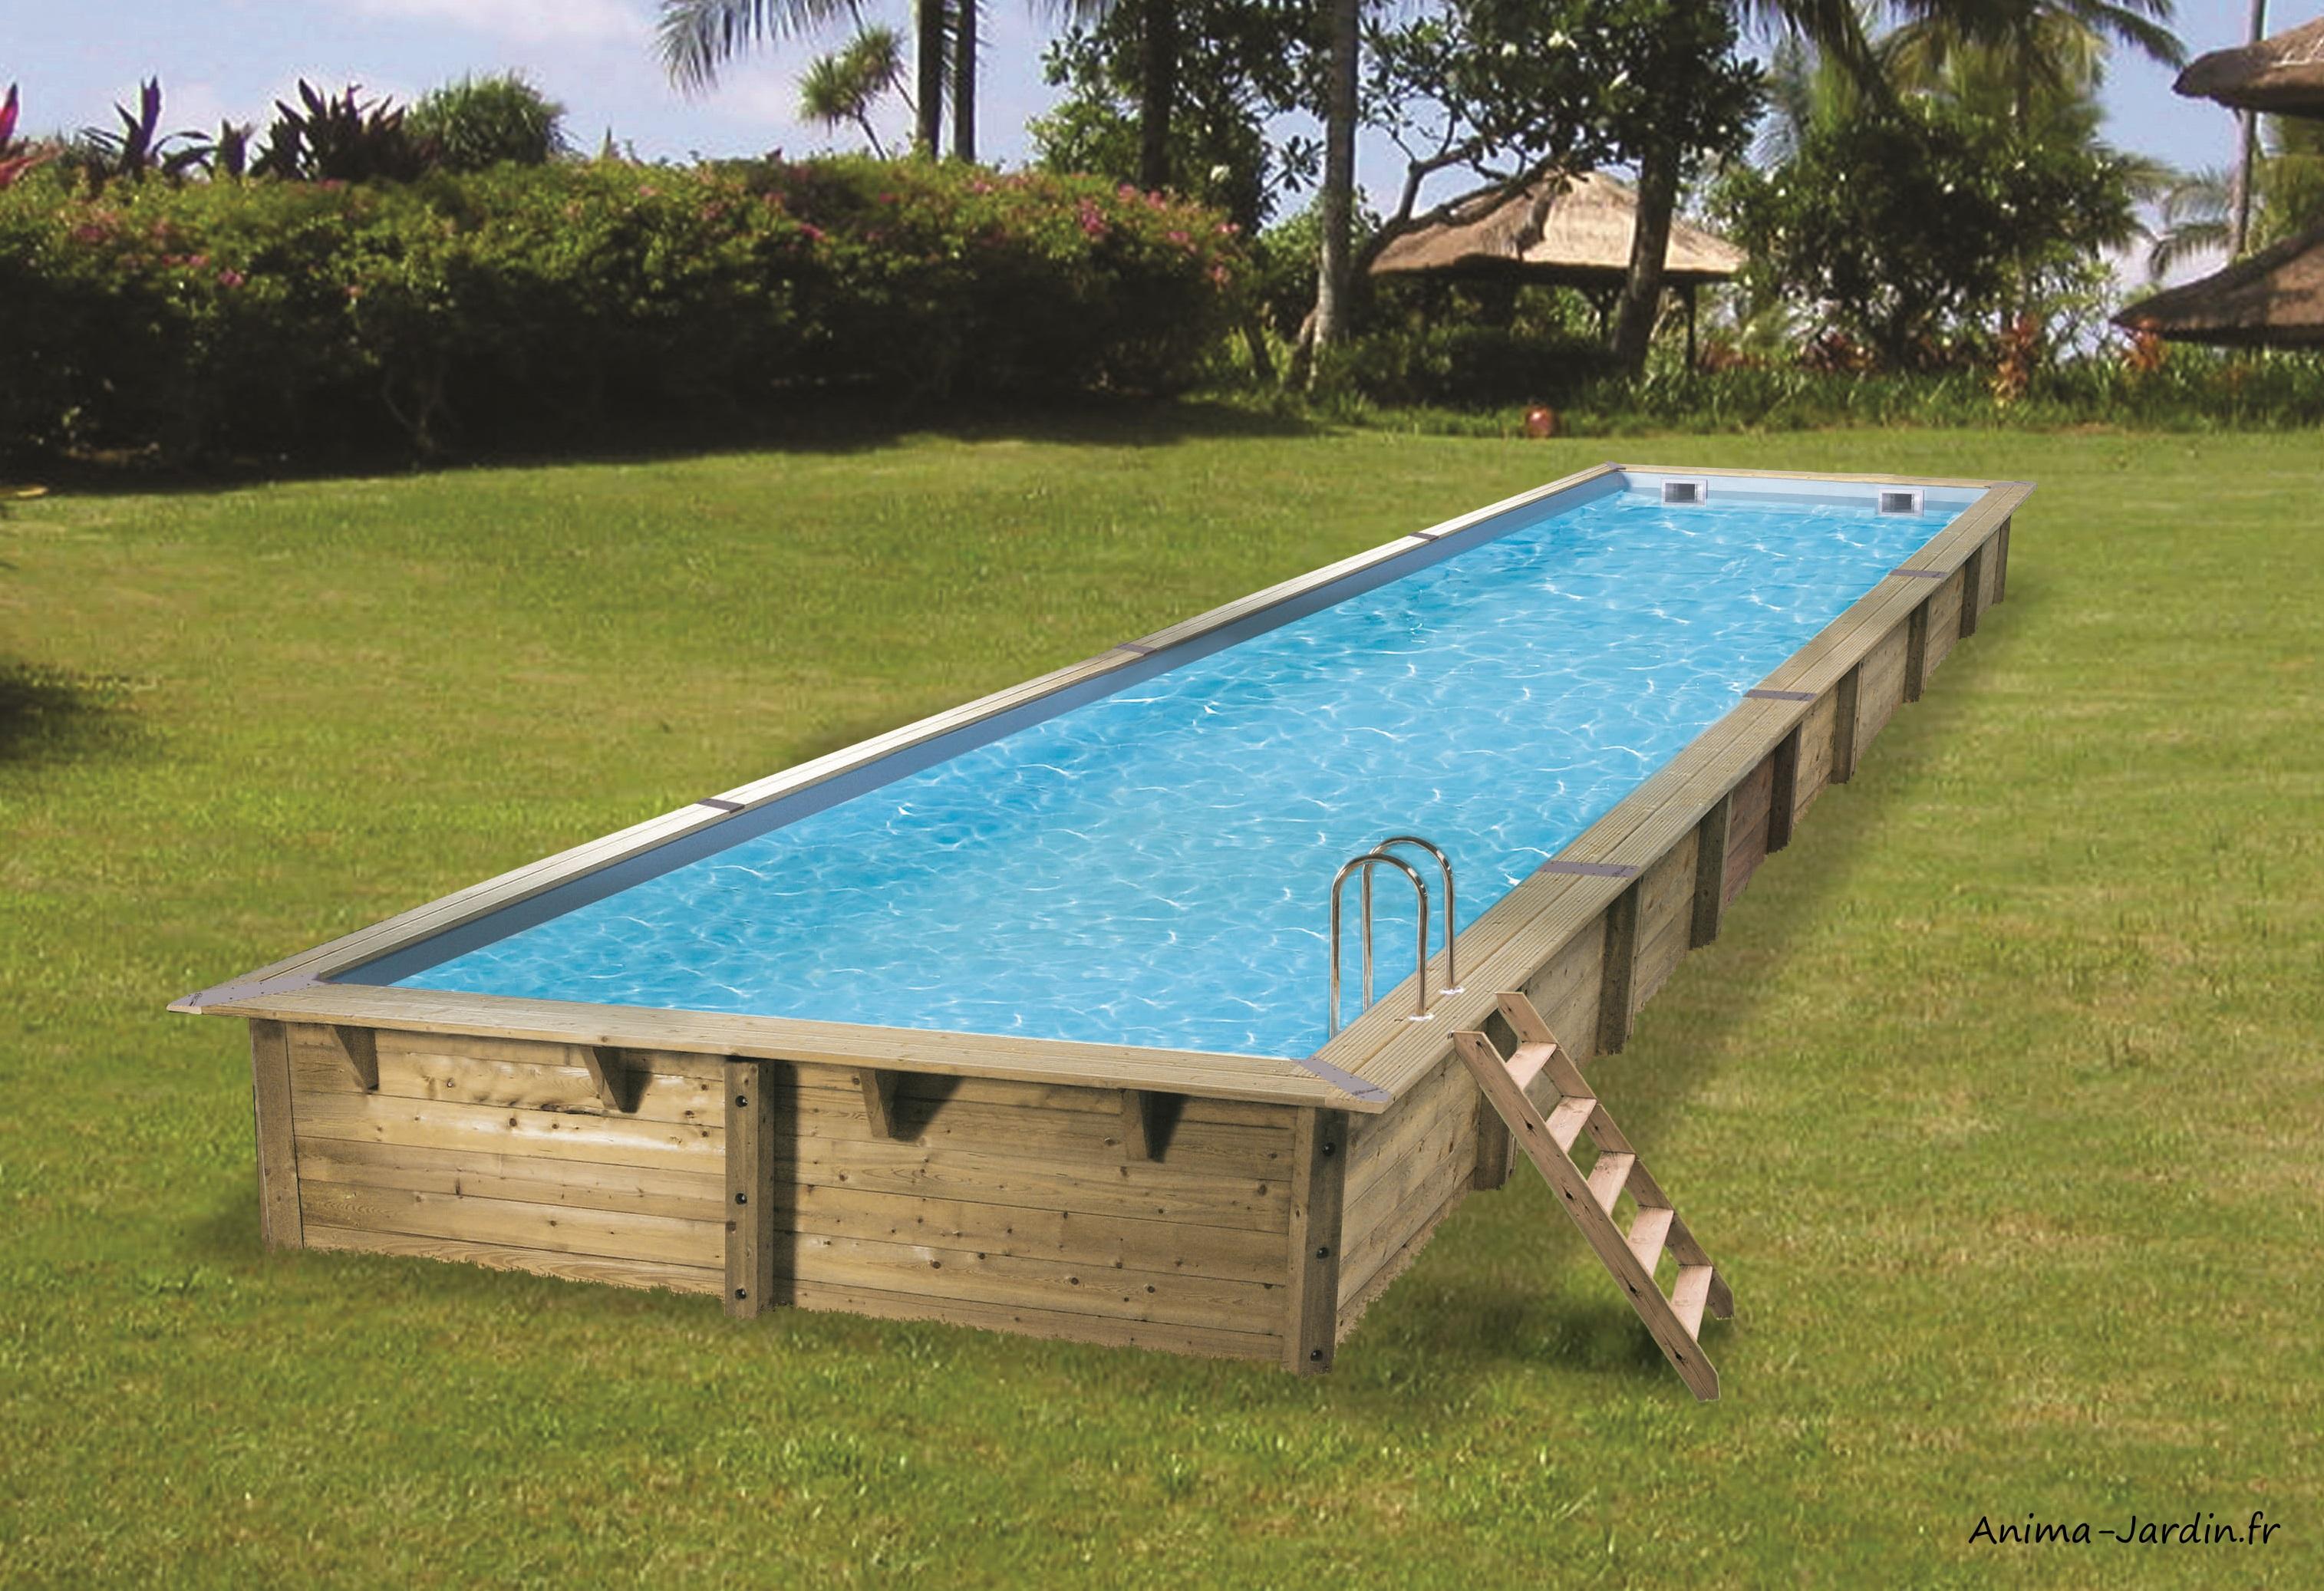 Grande piscine-Linéa-15,50m-H155 cm-rectangulaire-entourage bois-Ubbink-Anima-Jardin.fr